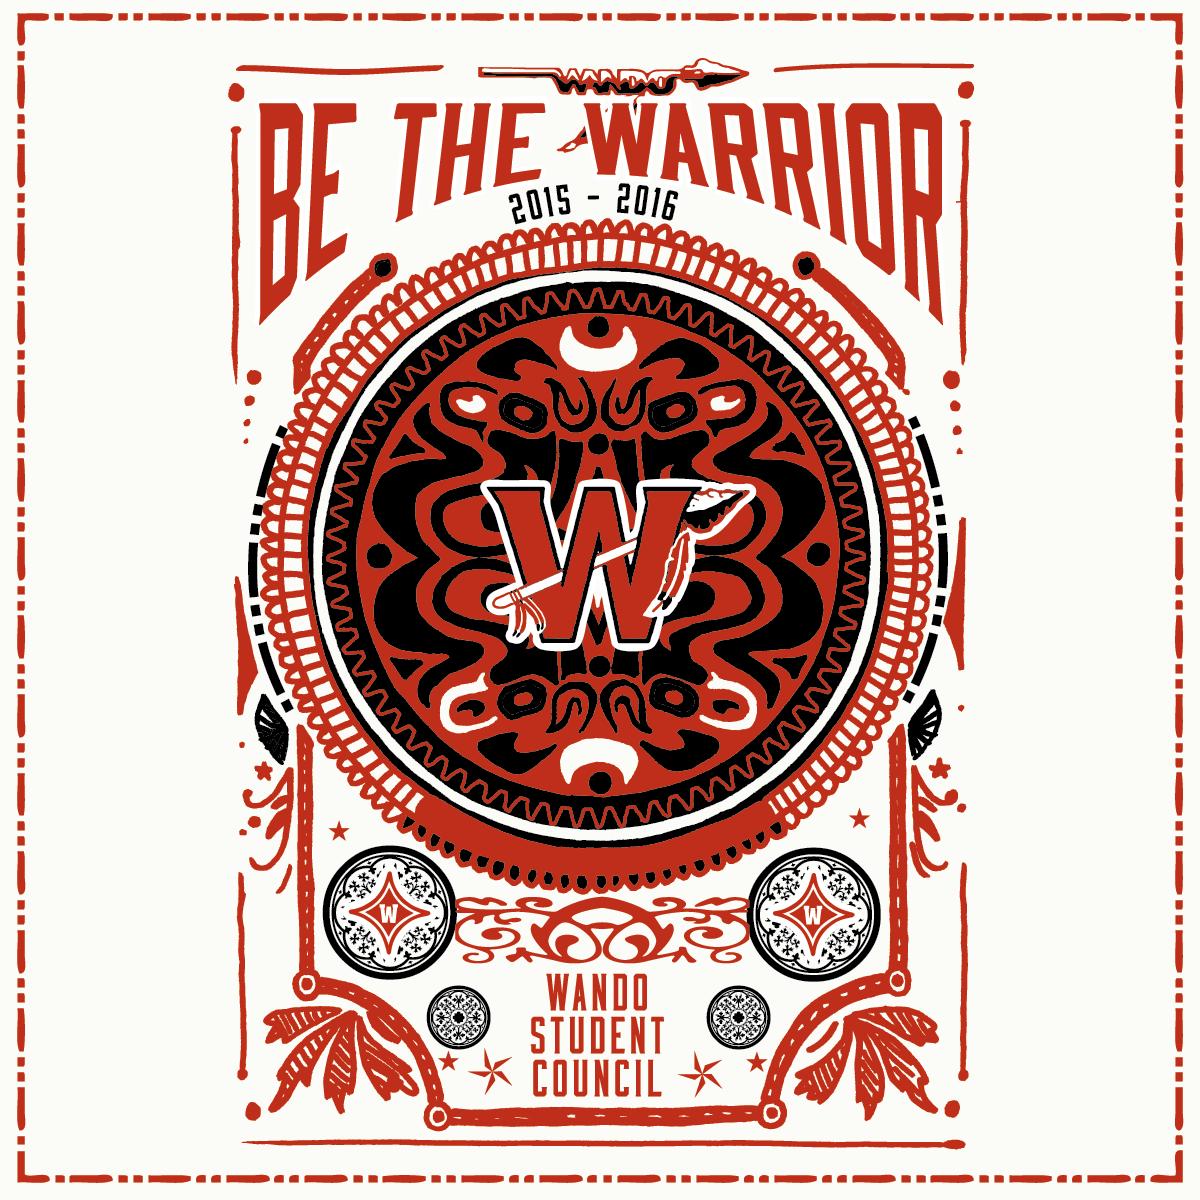 geneologie tee shirts custom apparel design custom apparel hand drawn custom - High School T Shirt Design Ideas